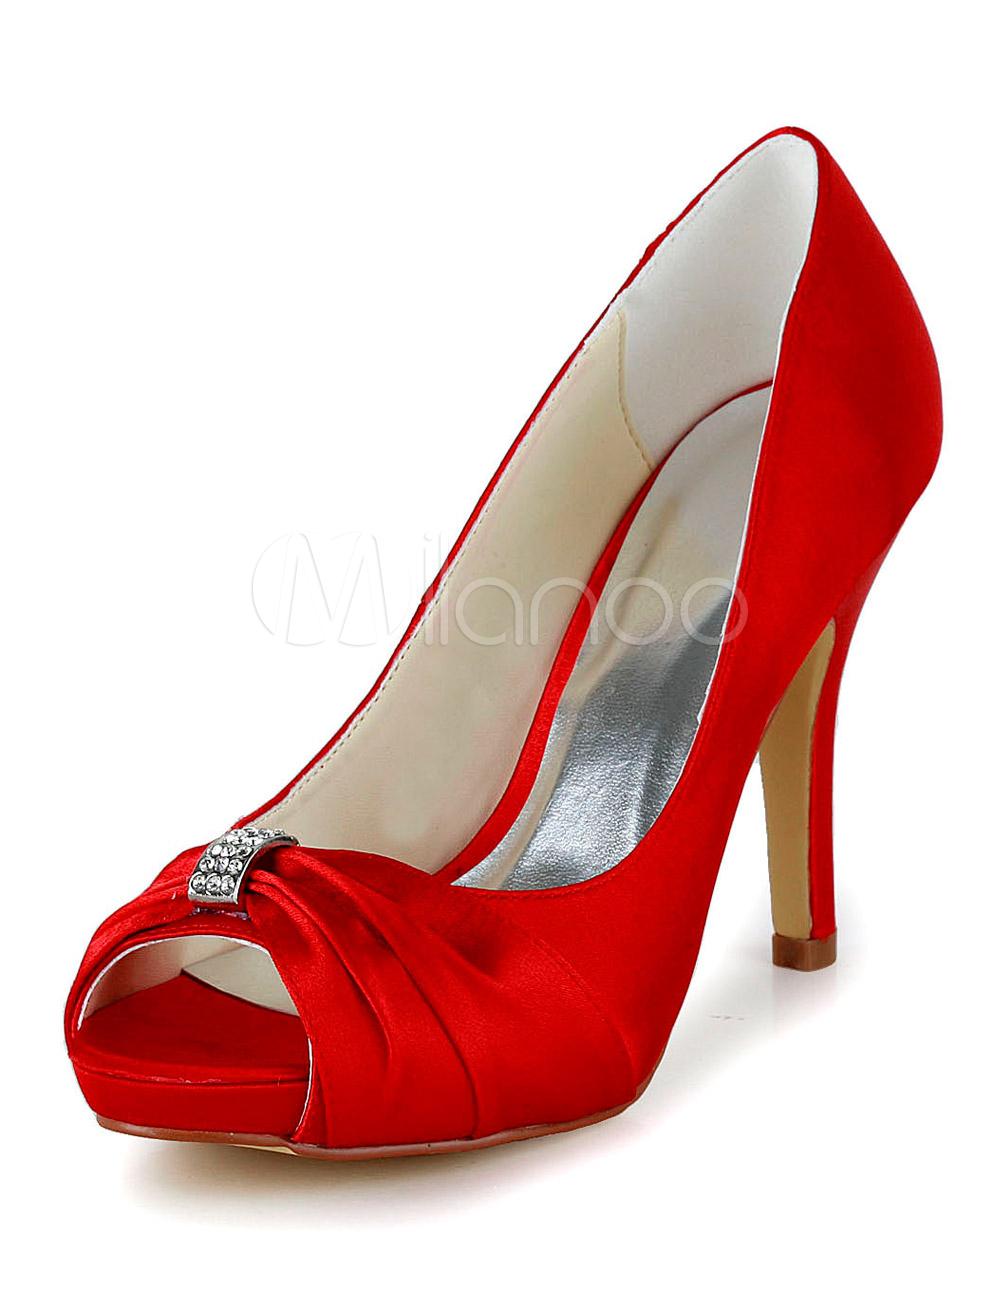 Red Satin Peep Toe Bridal Pumps